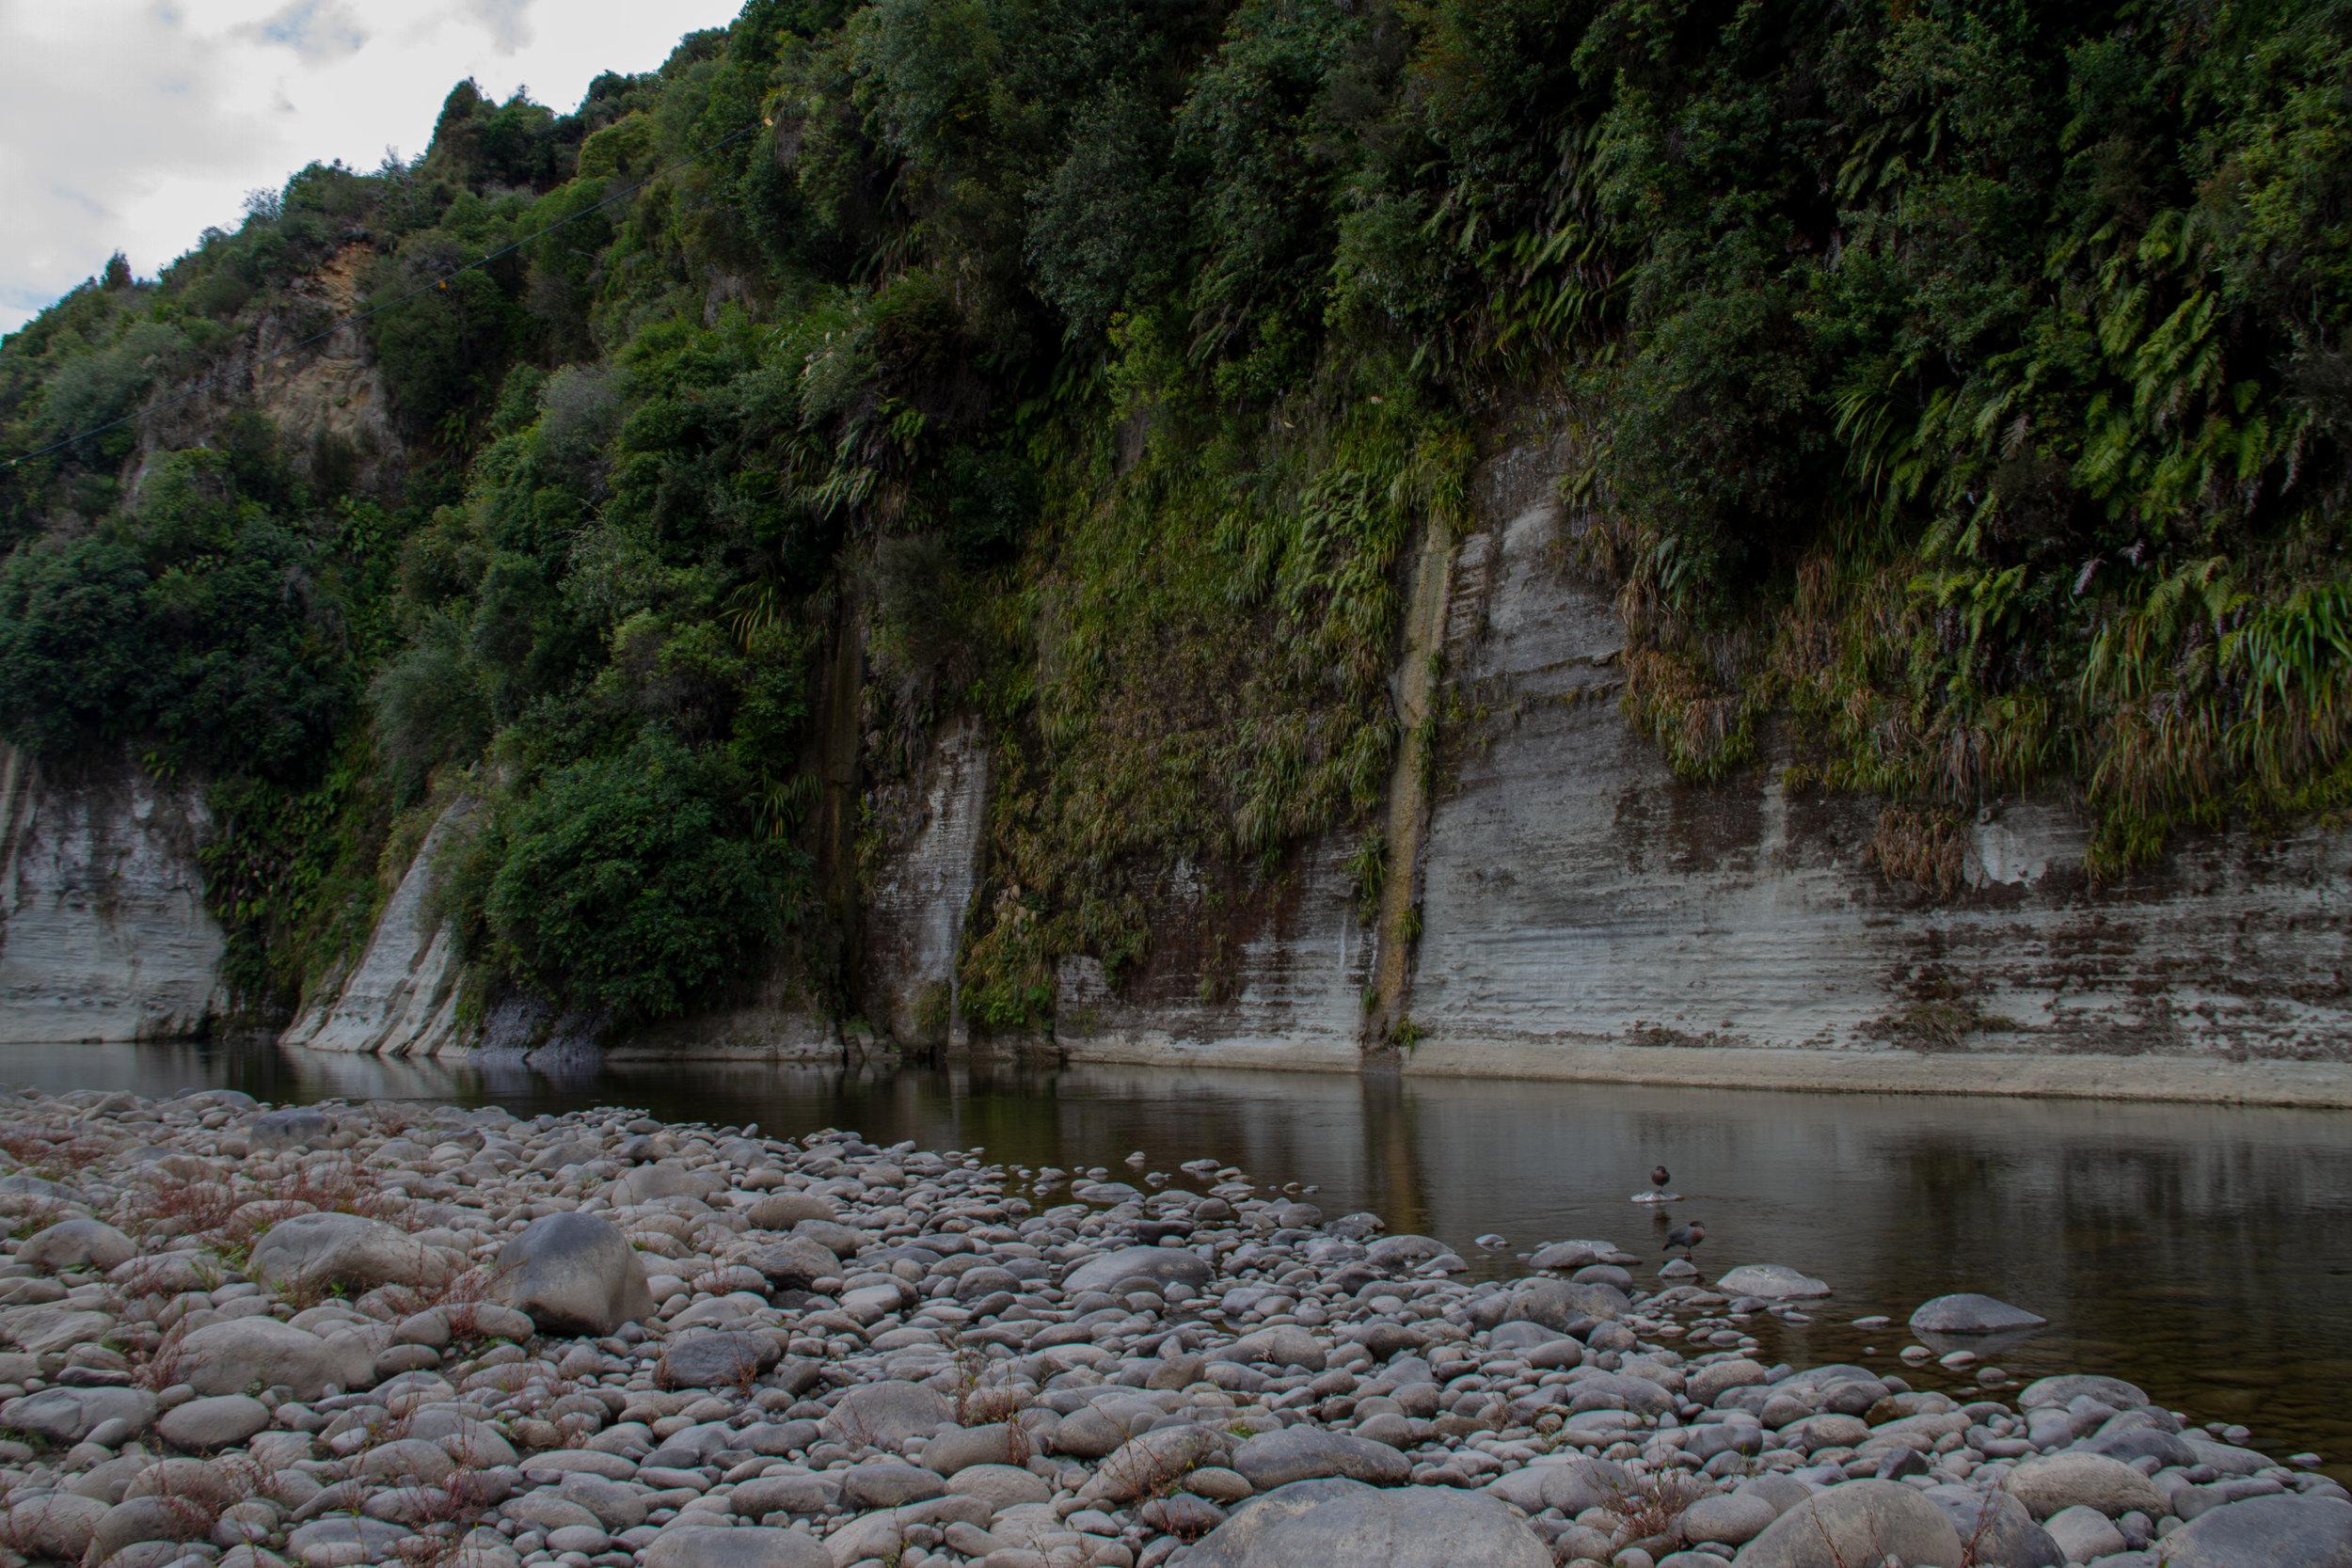 Two Whio Sleeping, Ruatiti River, Raetihi, 2019